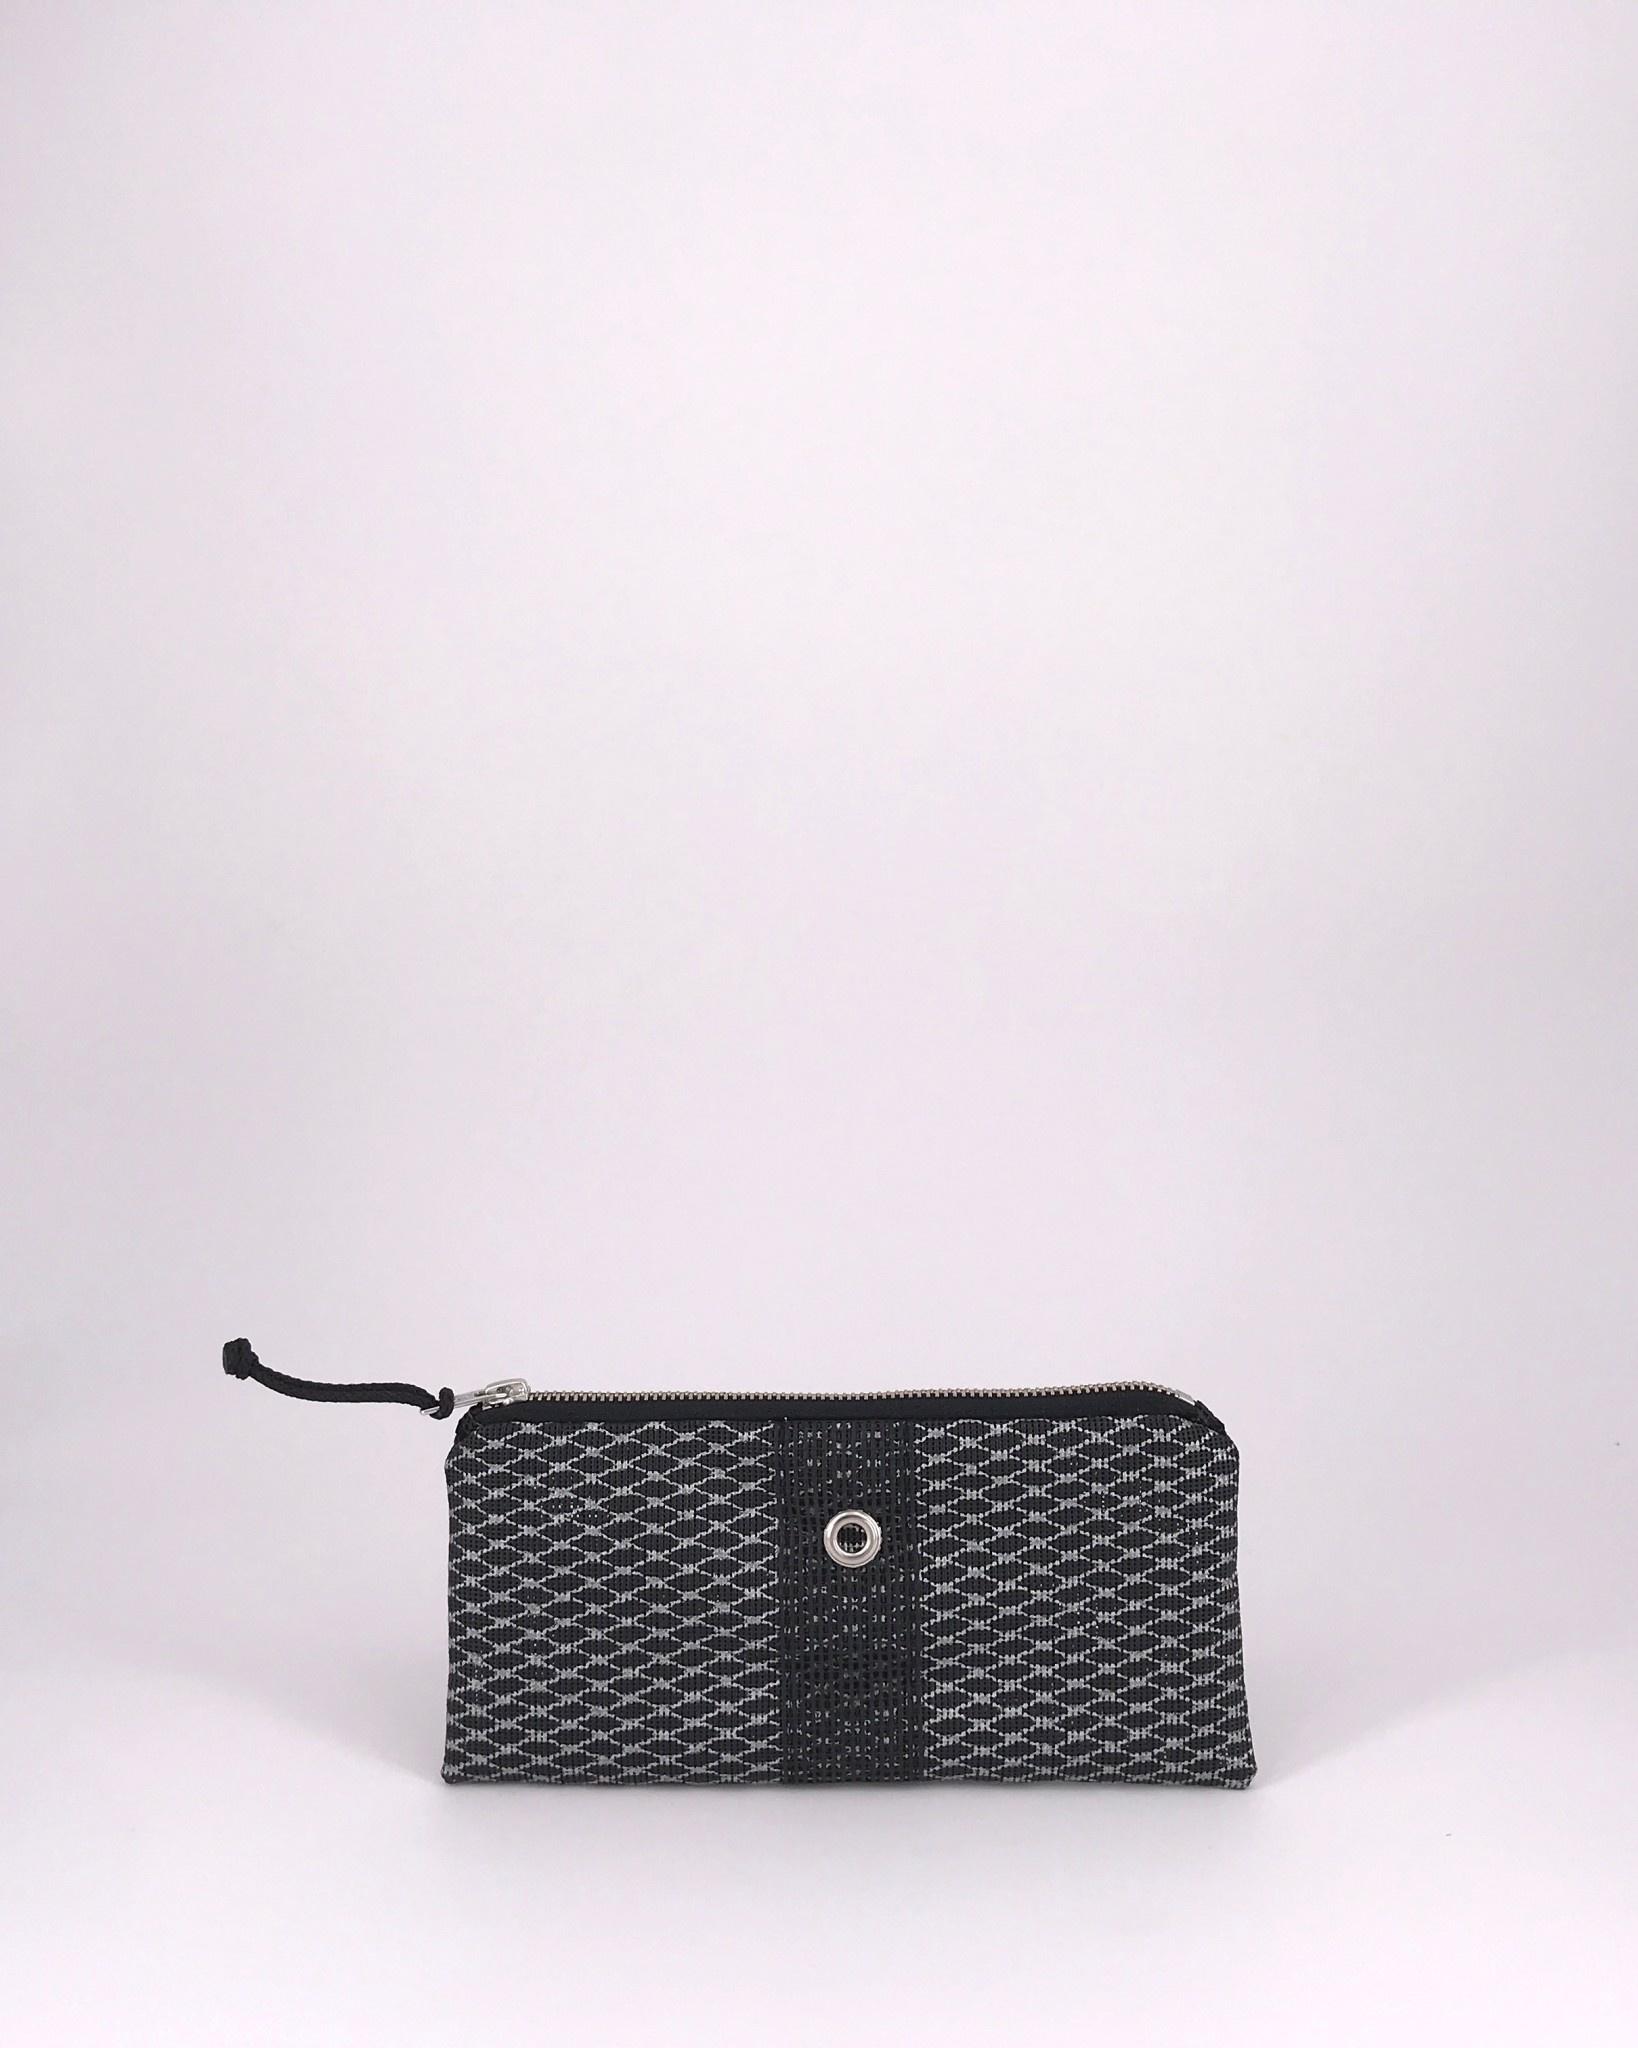 Alaina Marie ® Mini Silver on Black & Black Mini Clutch